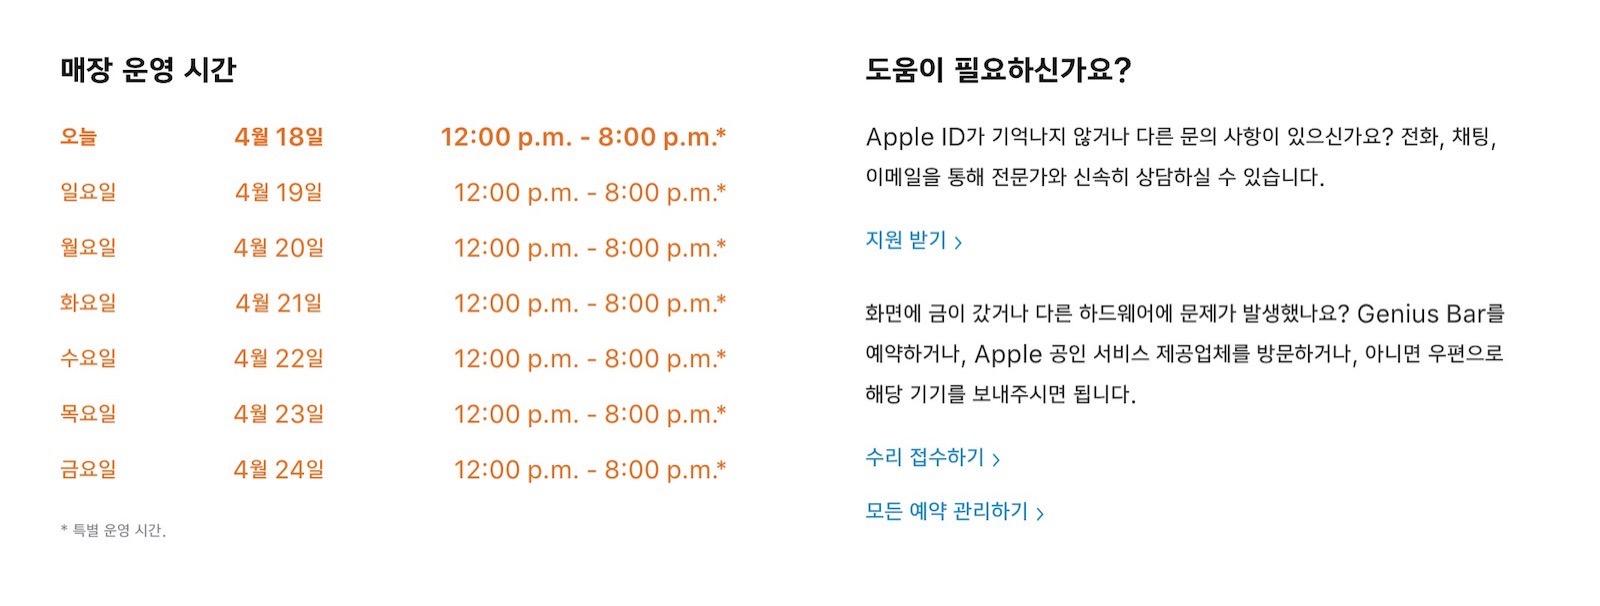 Seoul Apple Garosugil oepn again